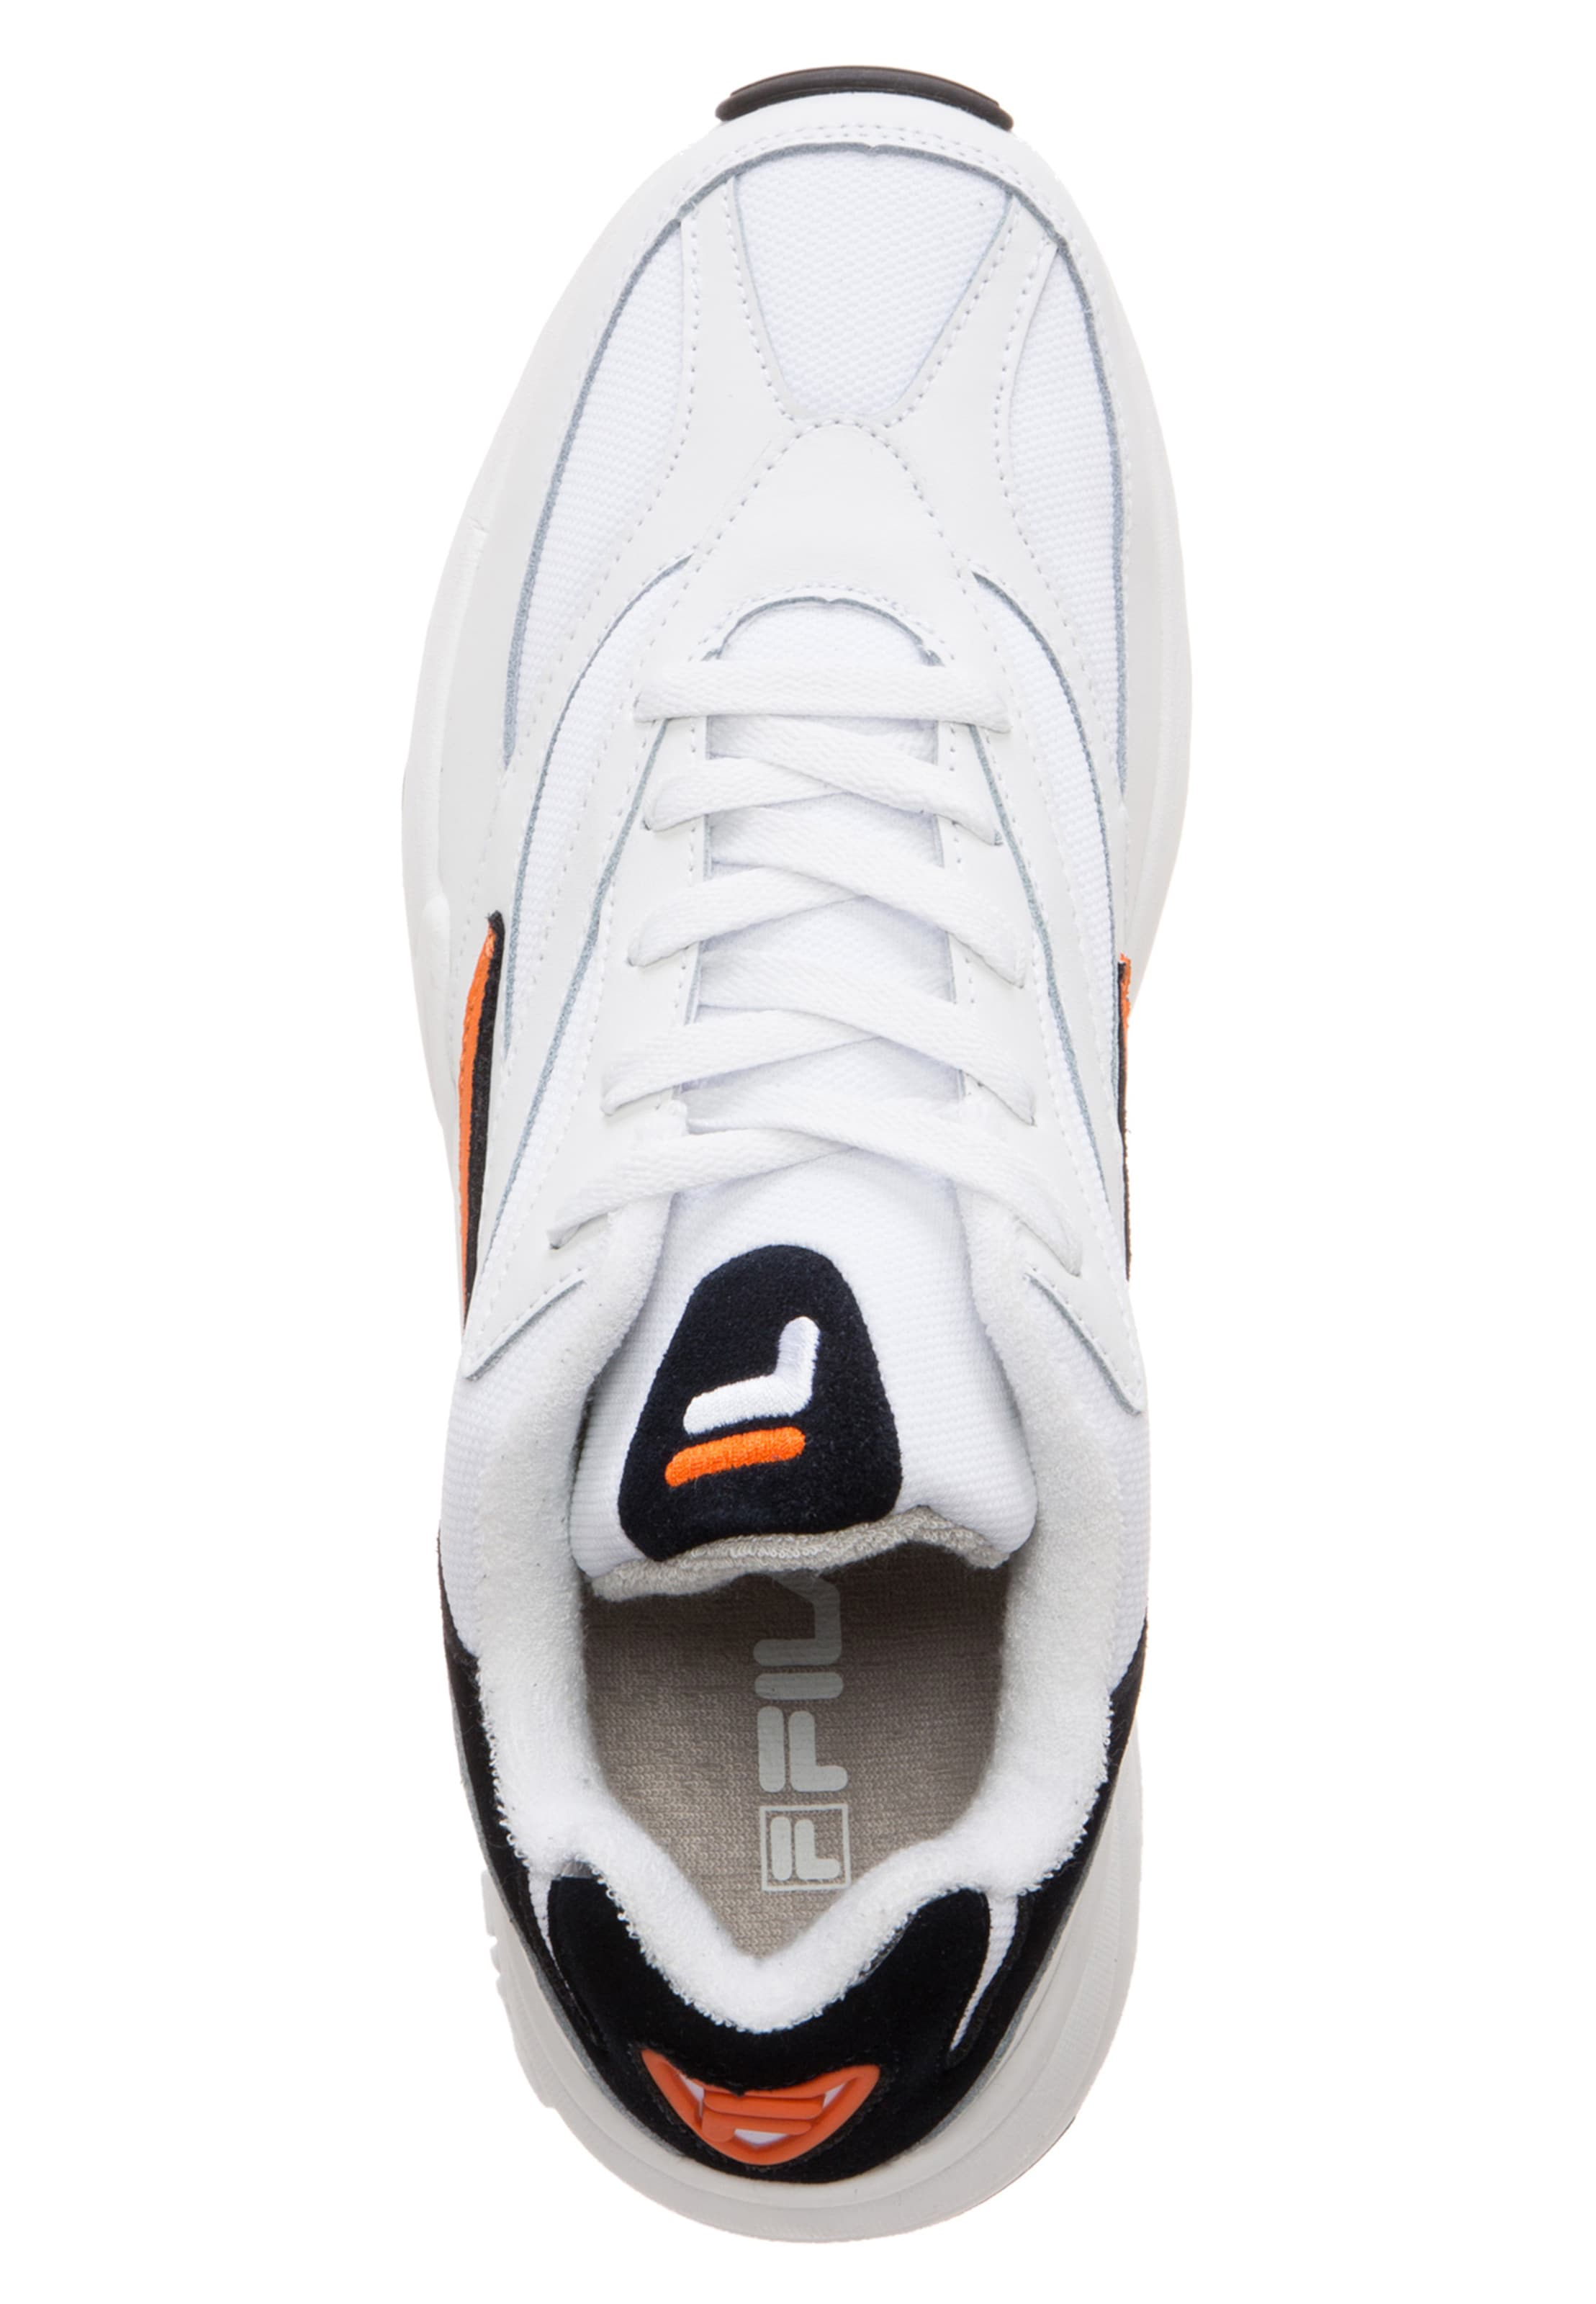 'heritage V94m' Sneaker Fila Weiß In OrangeSchwarz OPkTZiXu